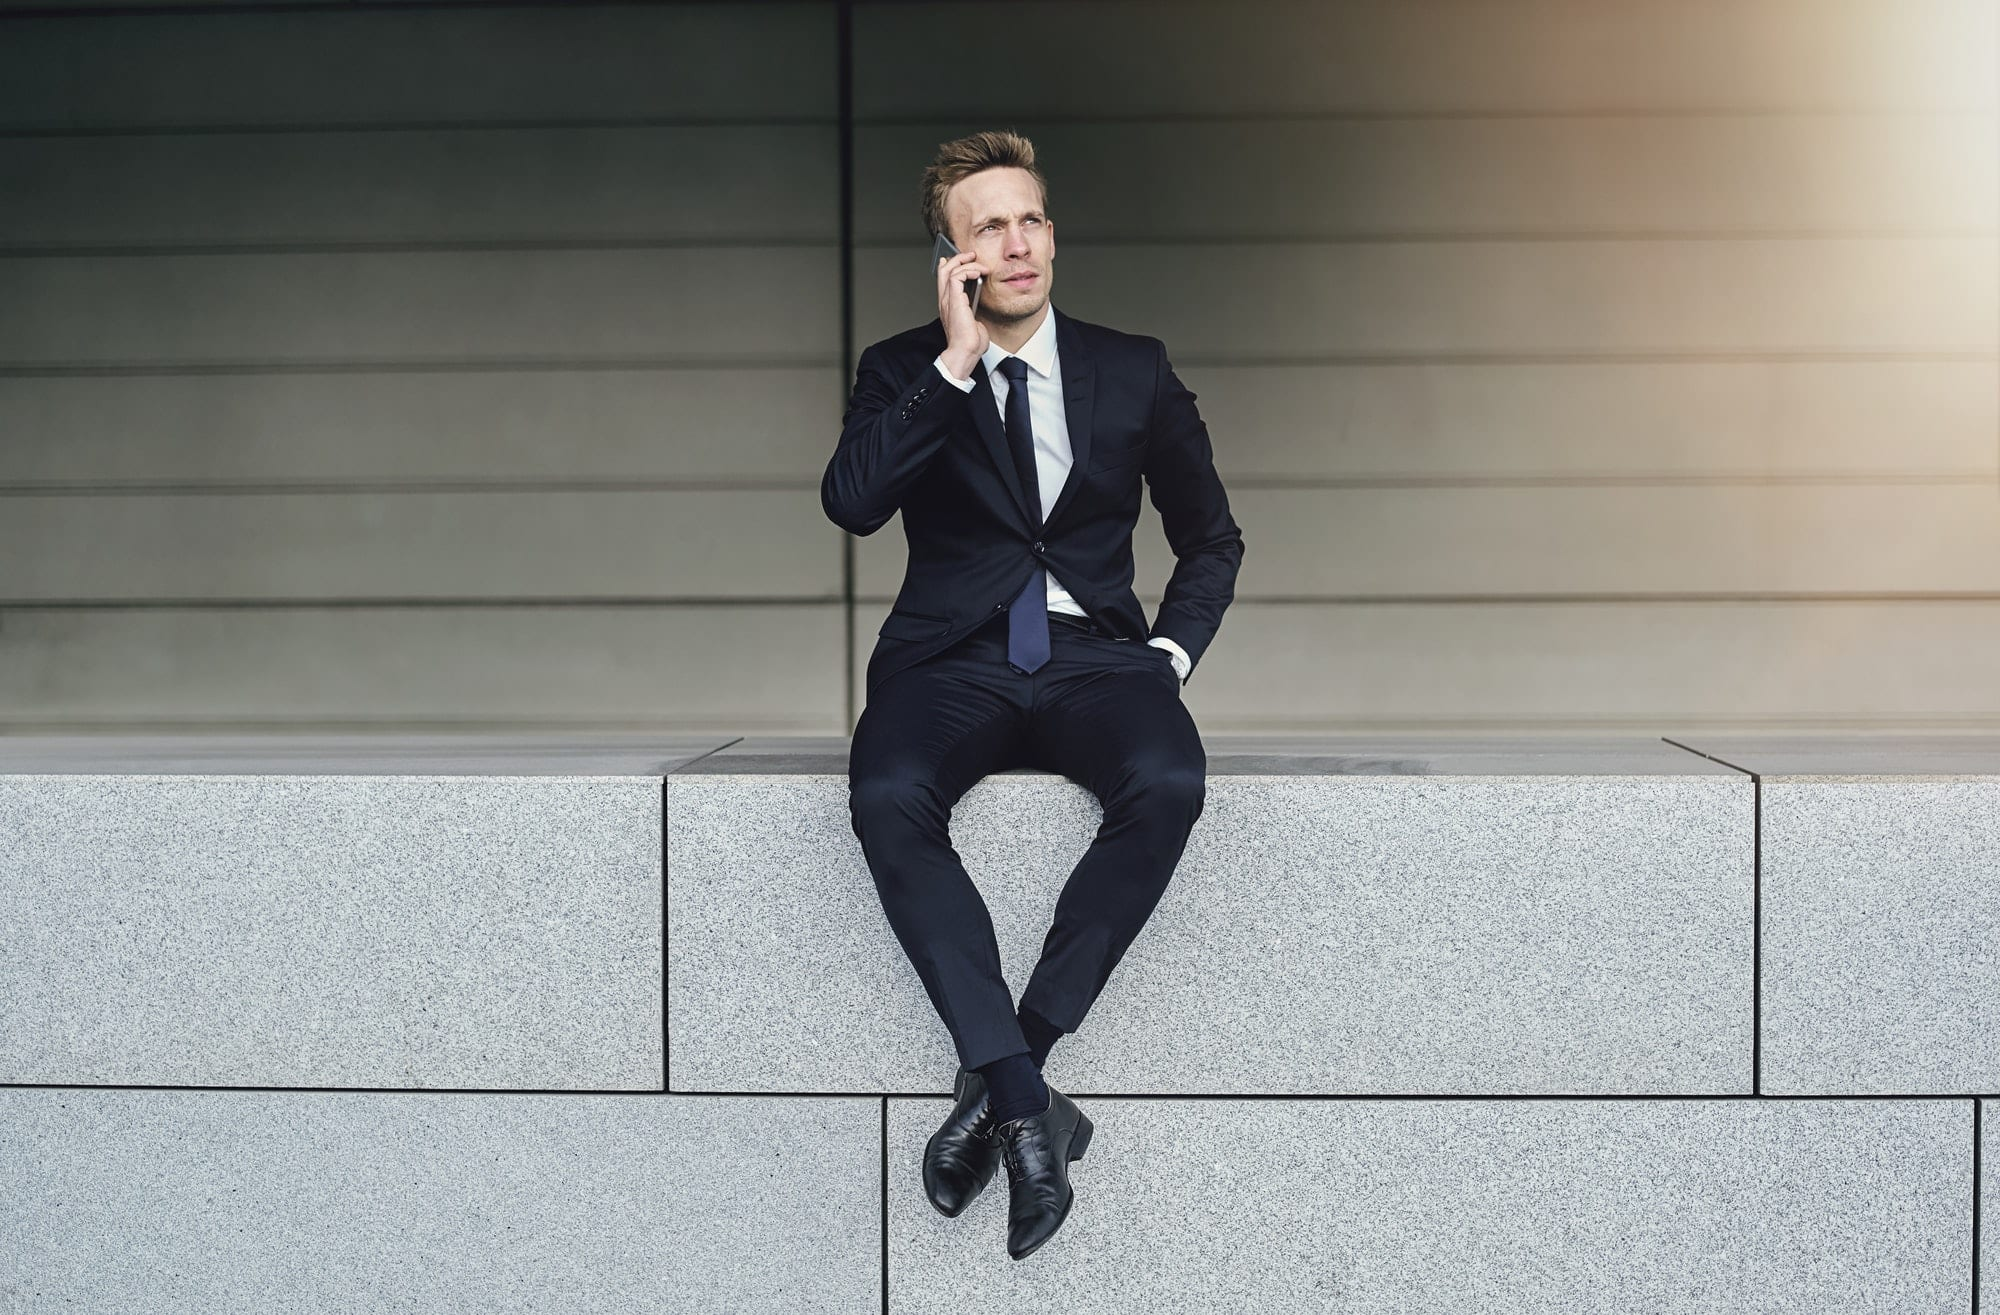 A businessman with legs crossed speaks phone